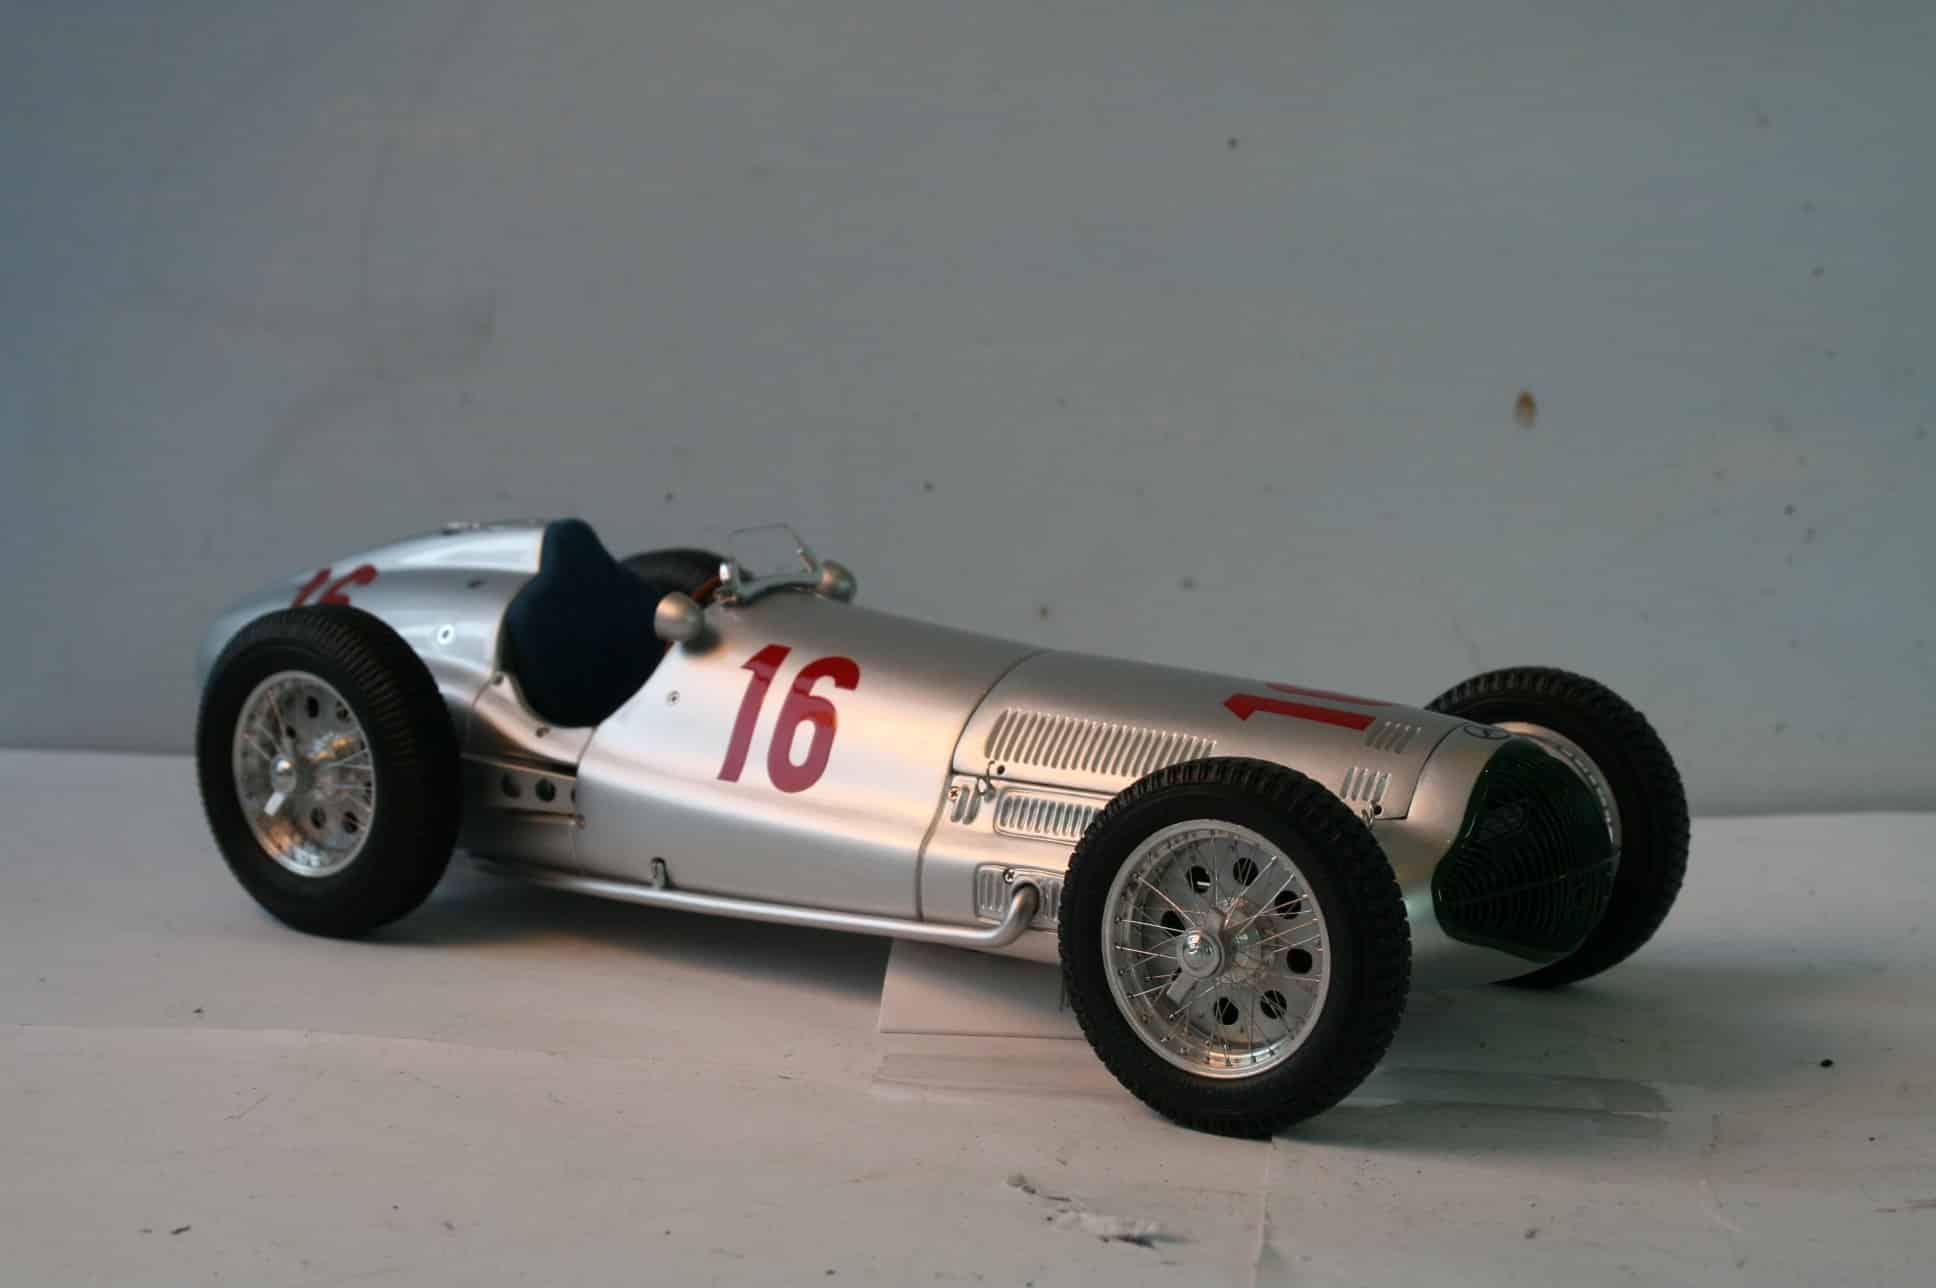 Mercedes-Benz 1938 W154 Car 16 German GP